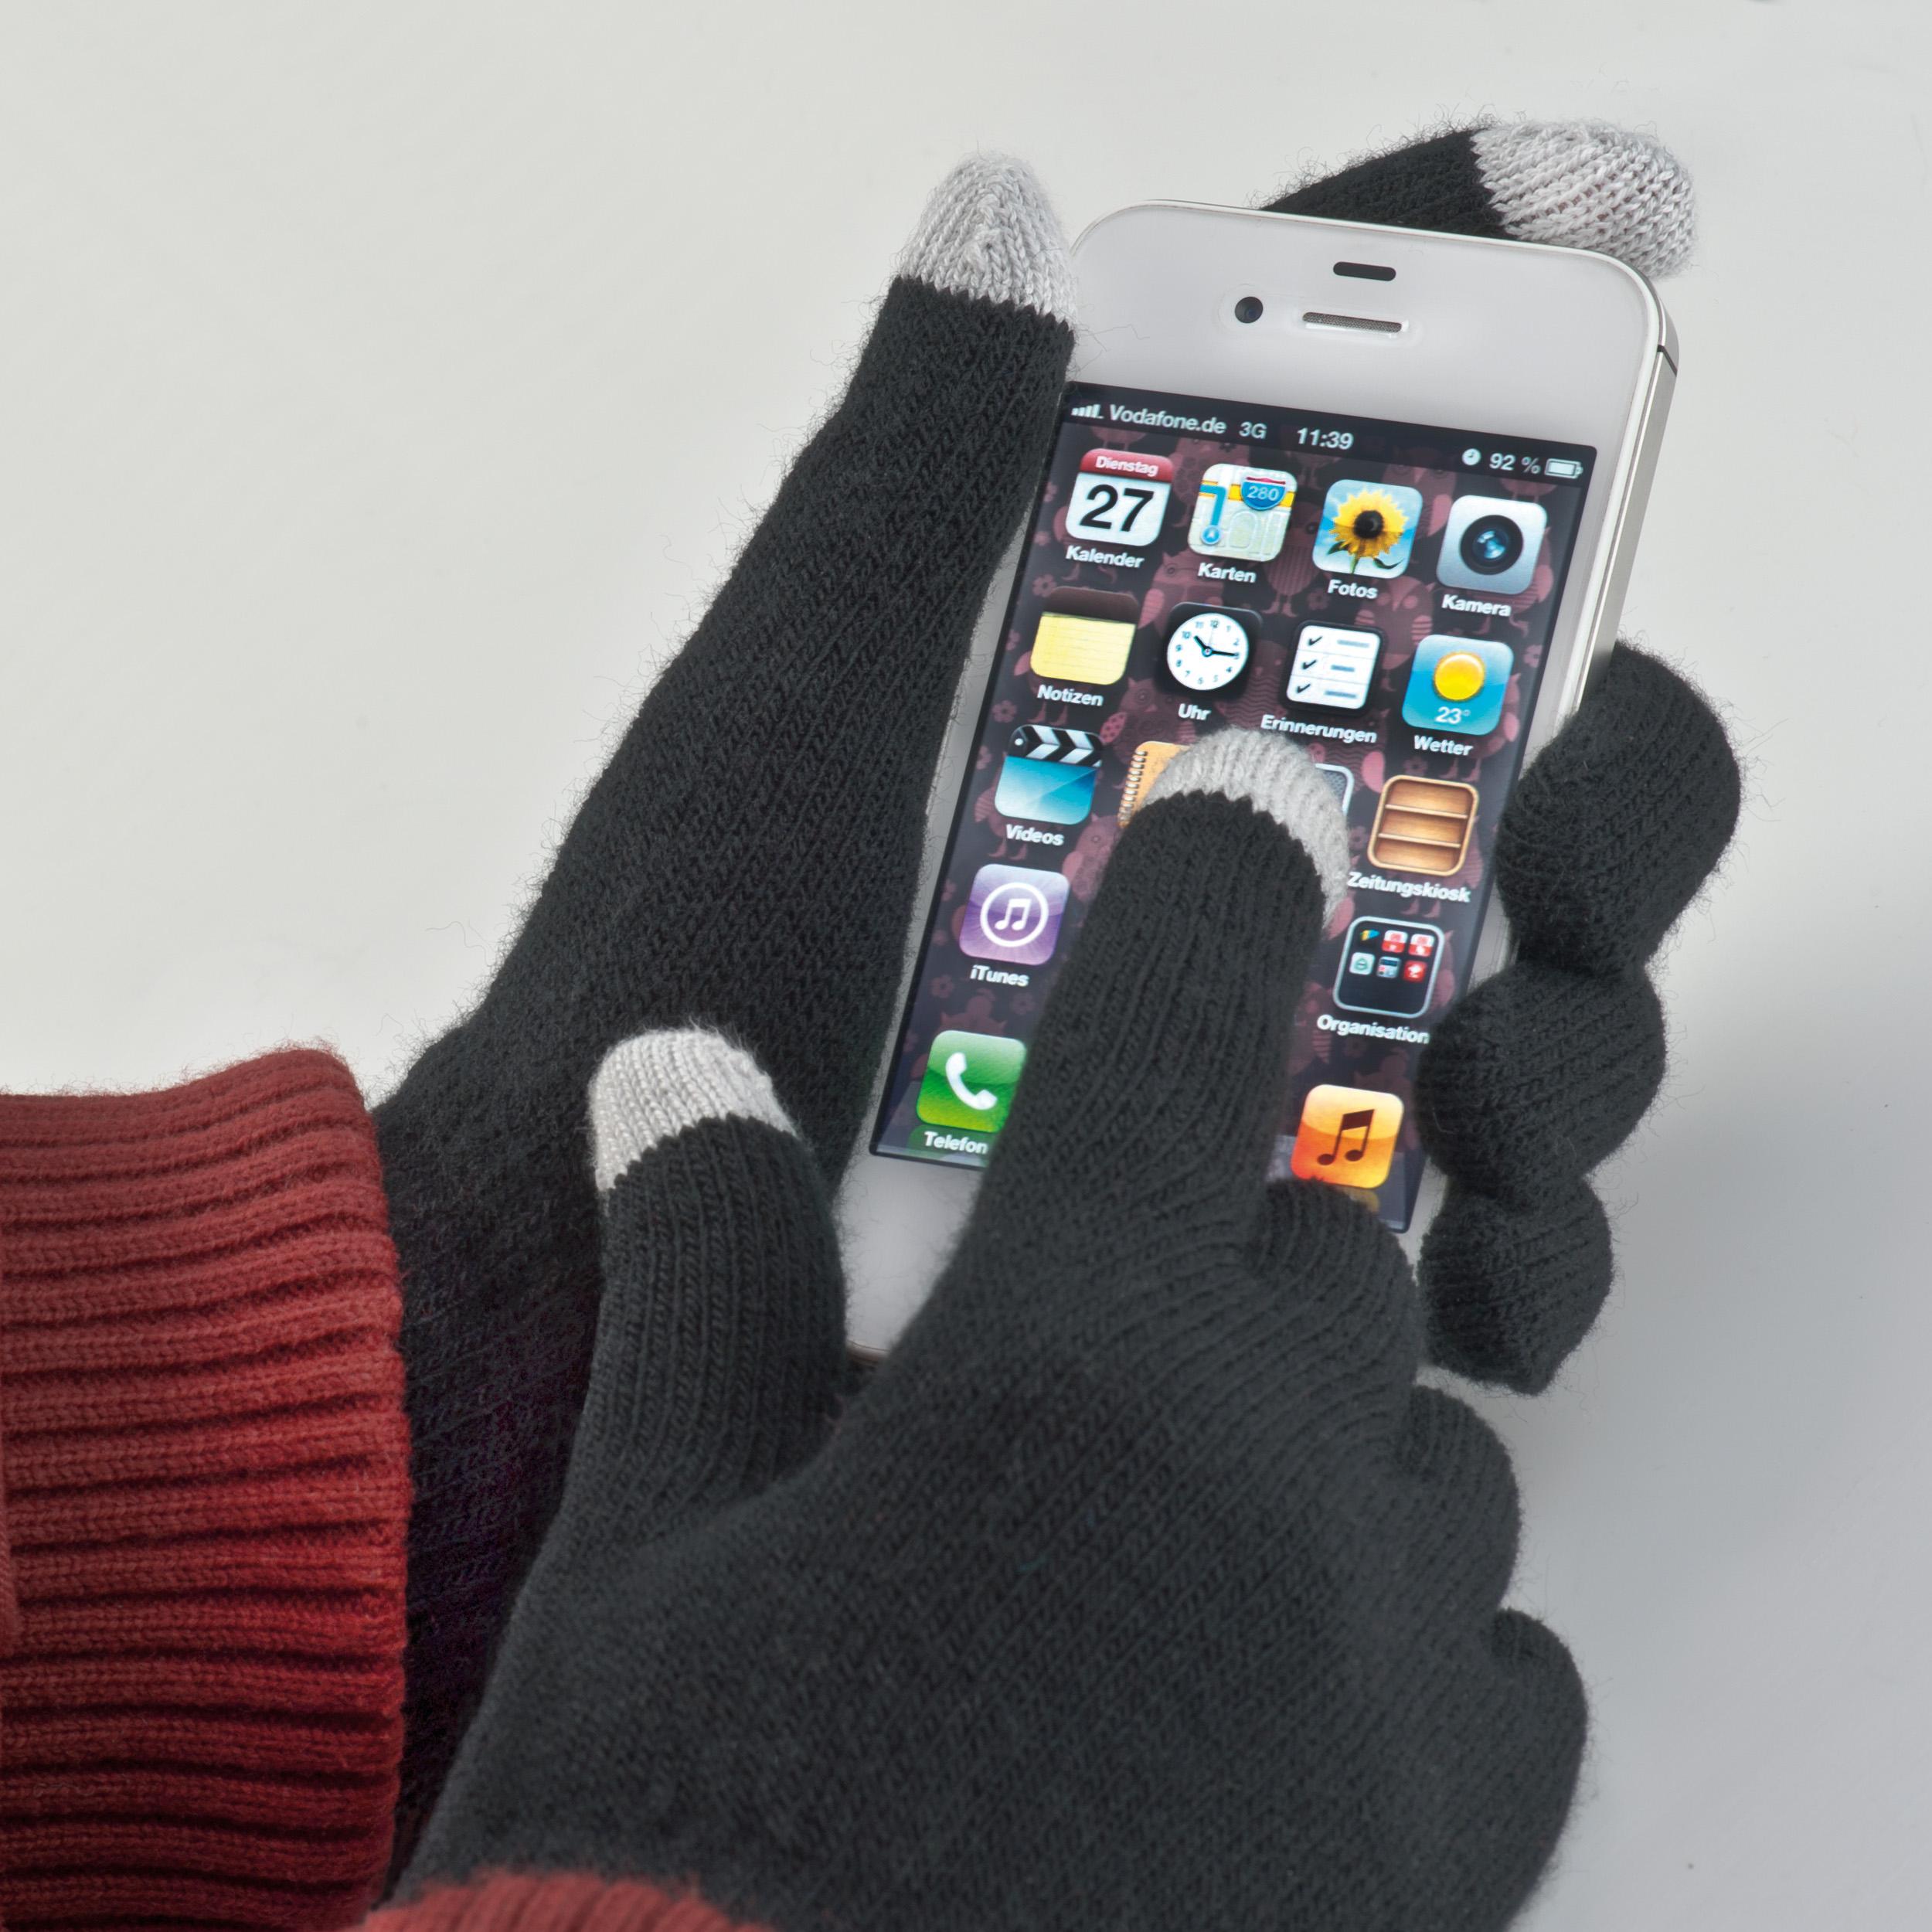 Gants synthétiques avec 2 doigts fonction PDA